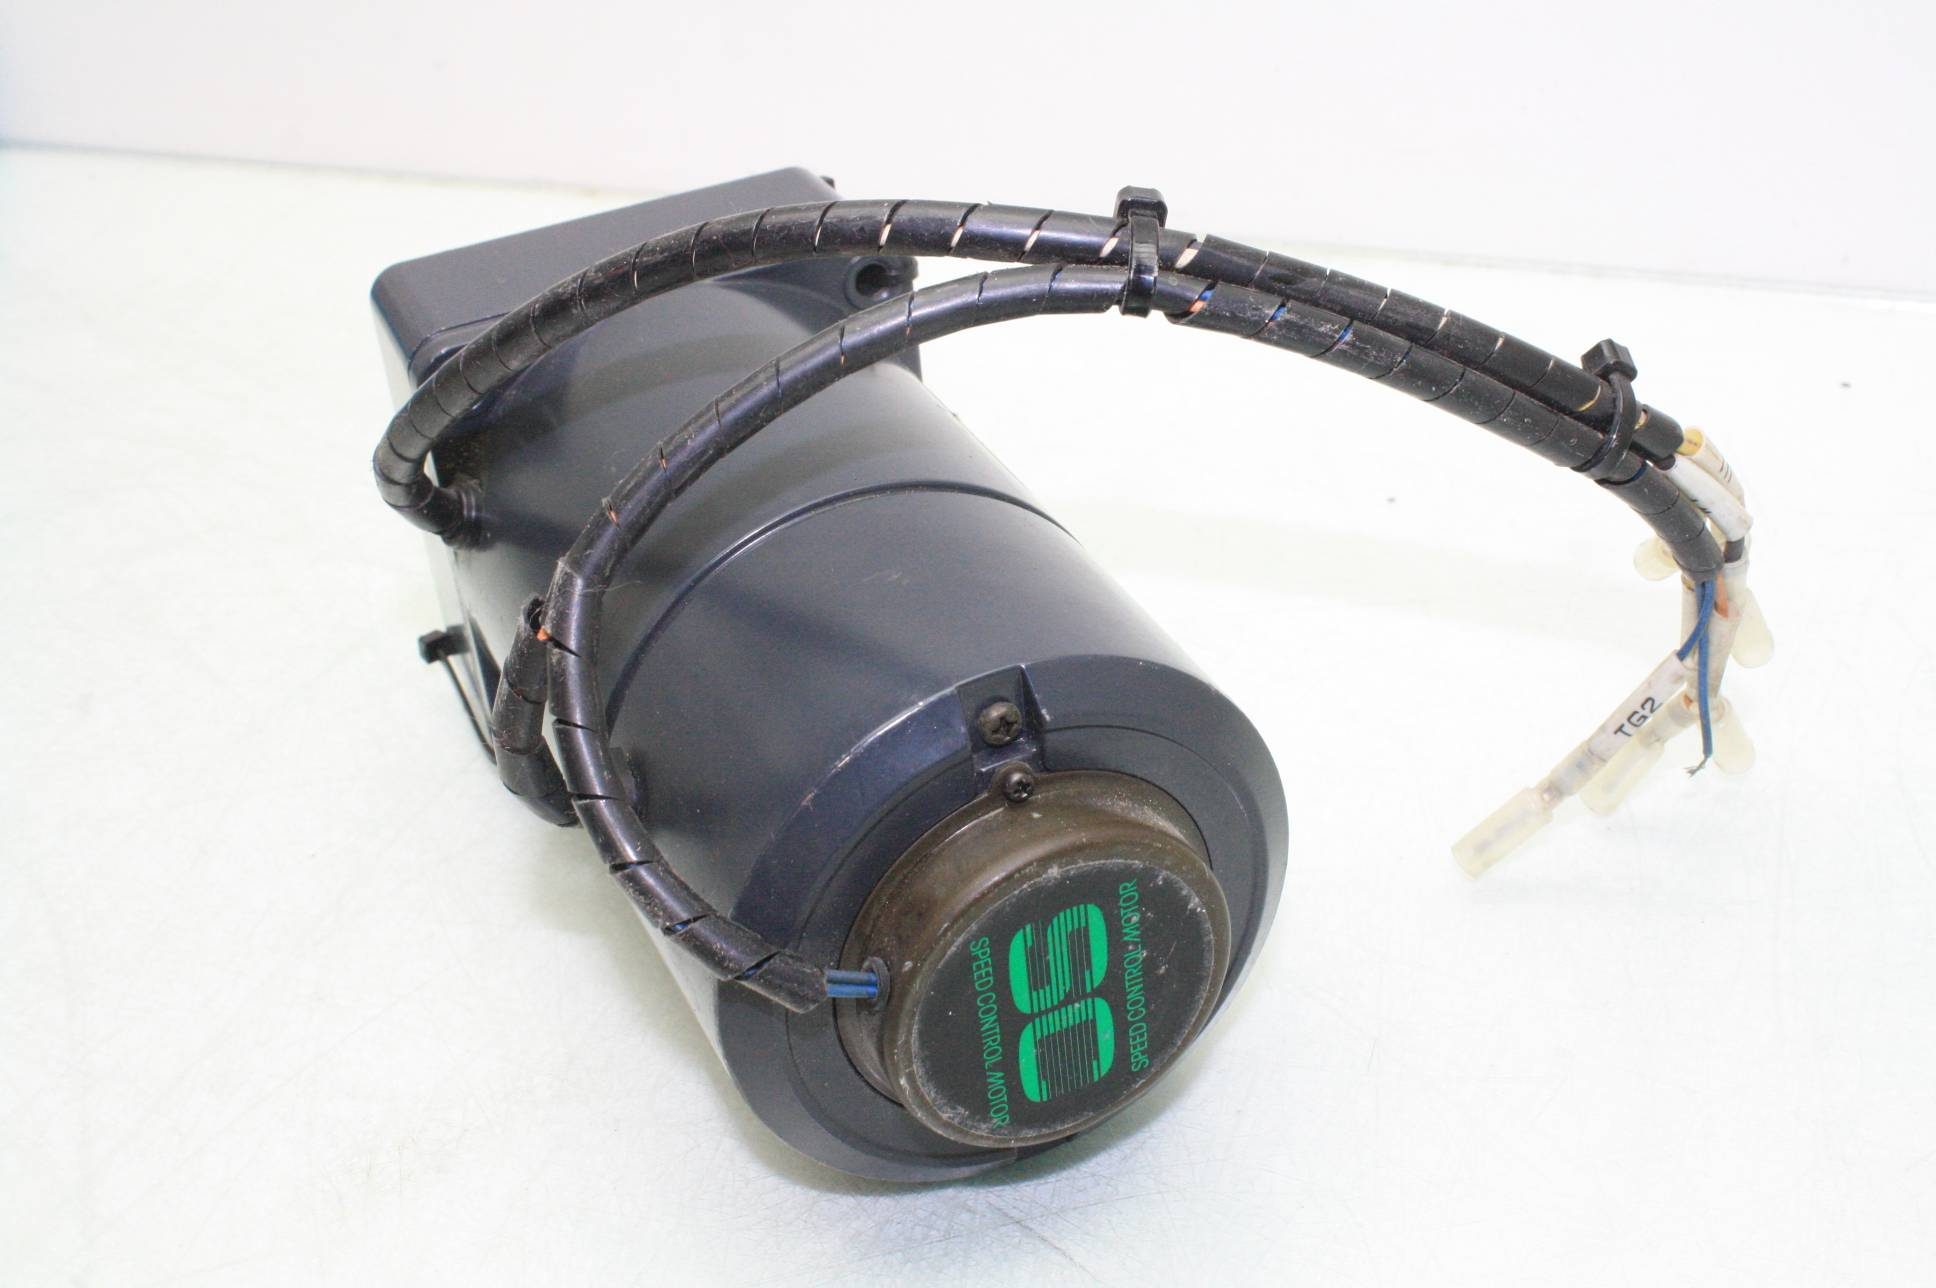 Oriental Motor Mbm425 412 Ac Brake Speed Control Motor W